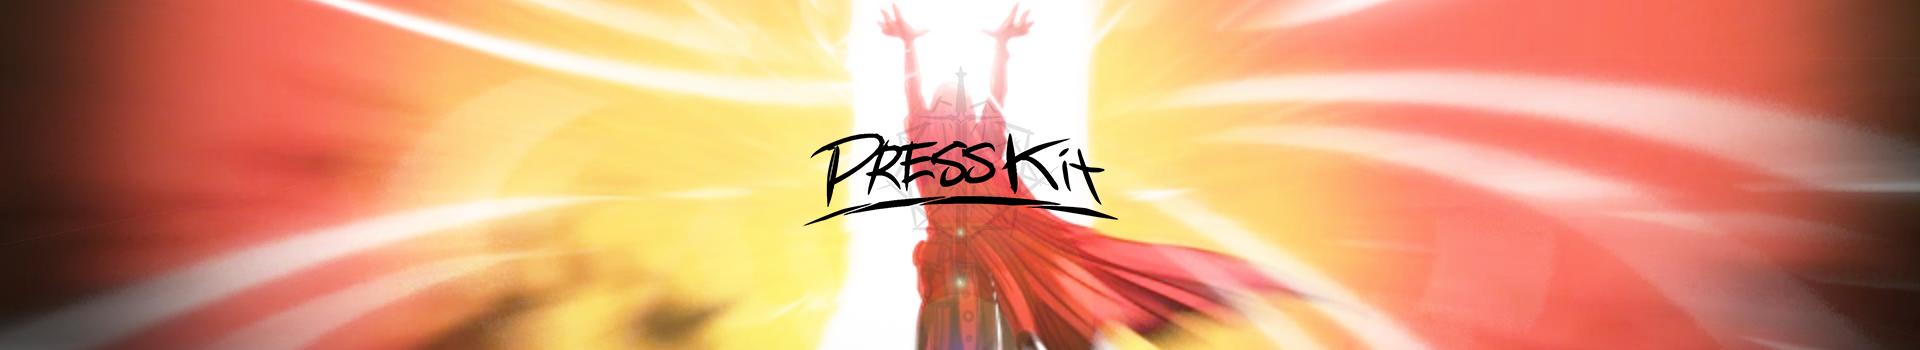 The Last Spell - Presskit Background